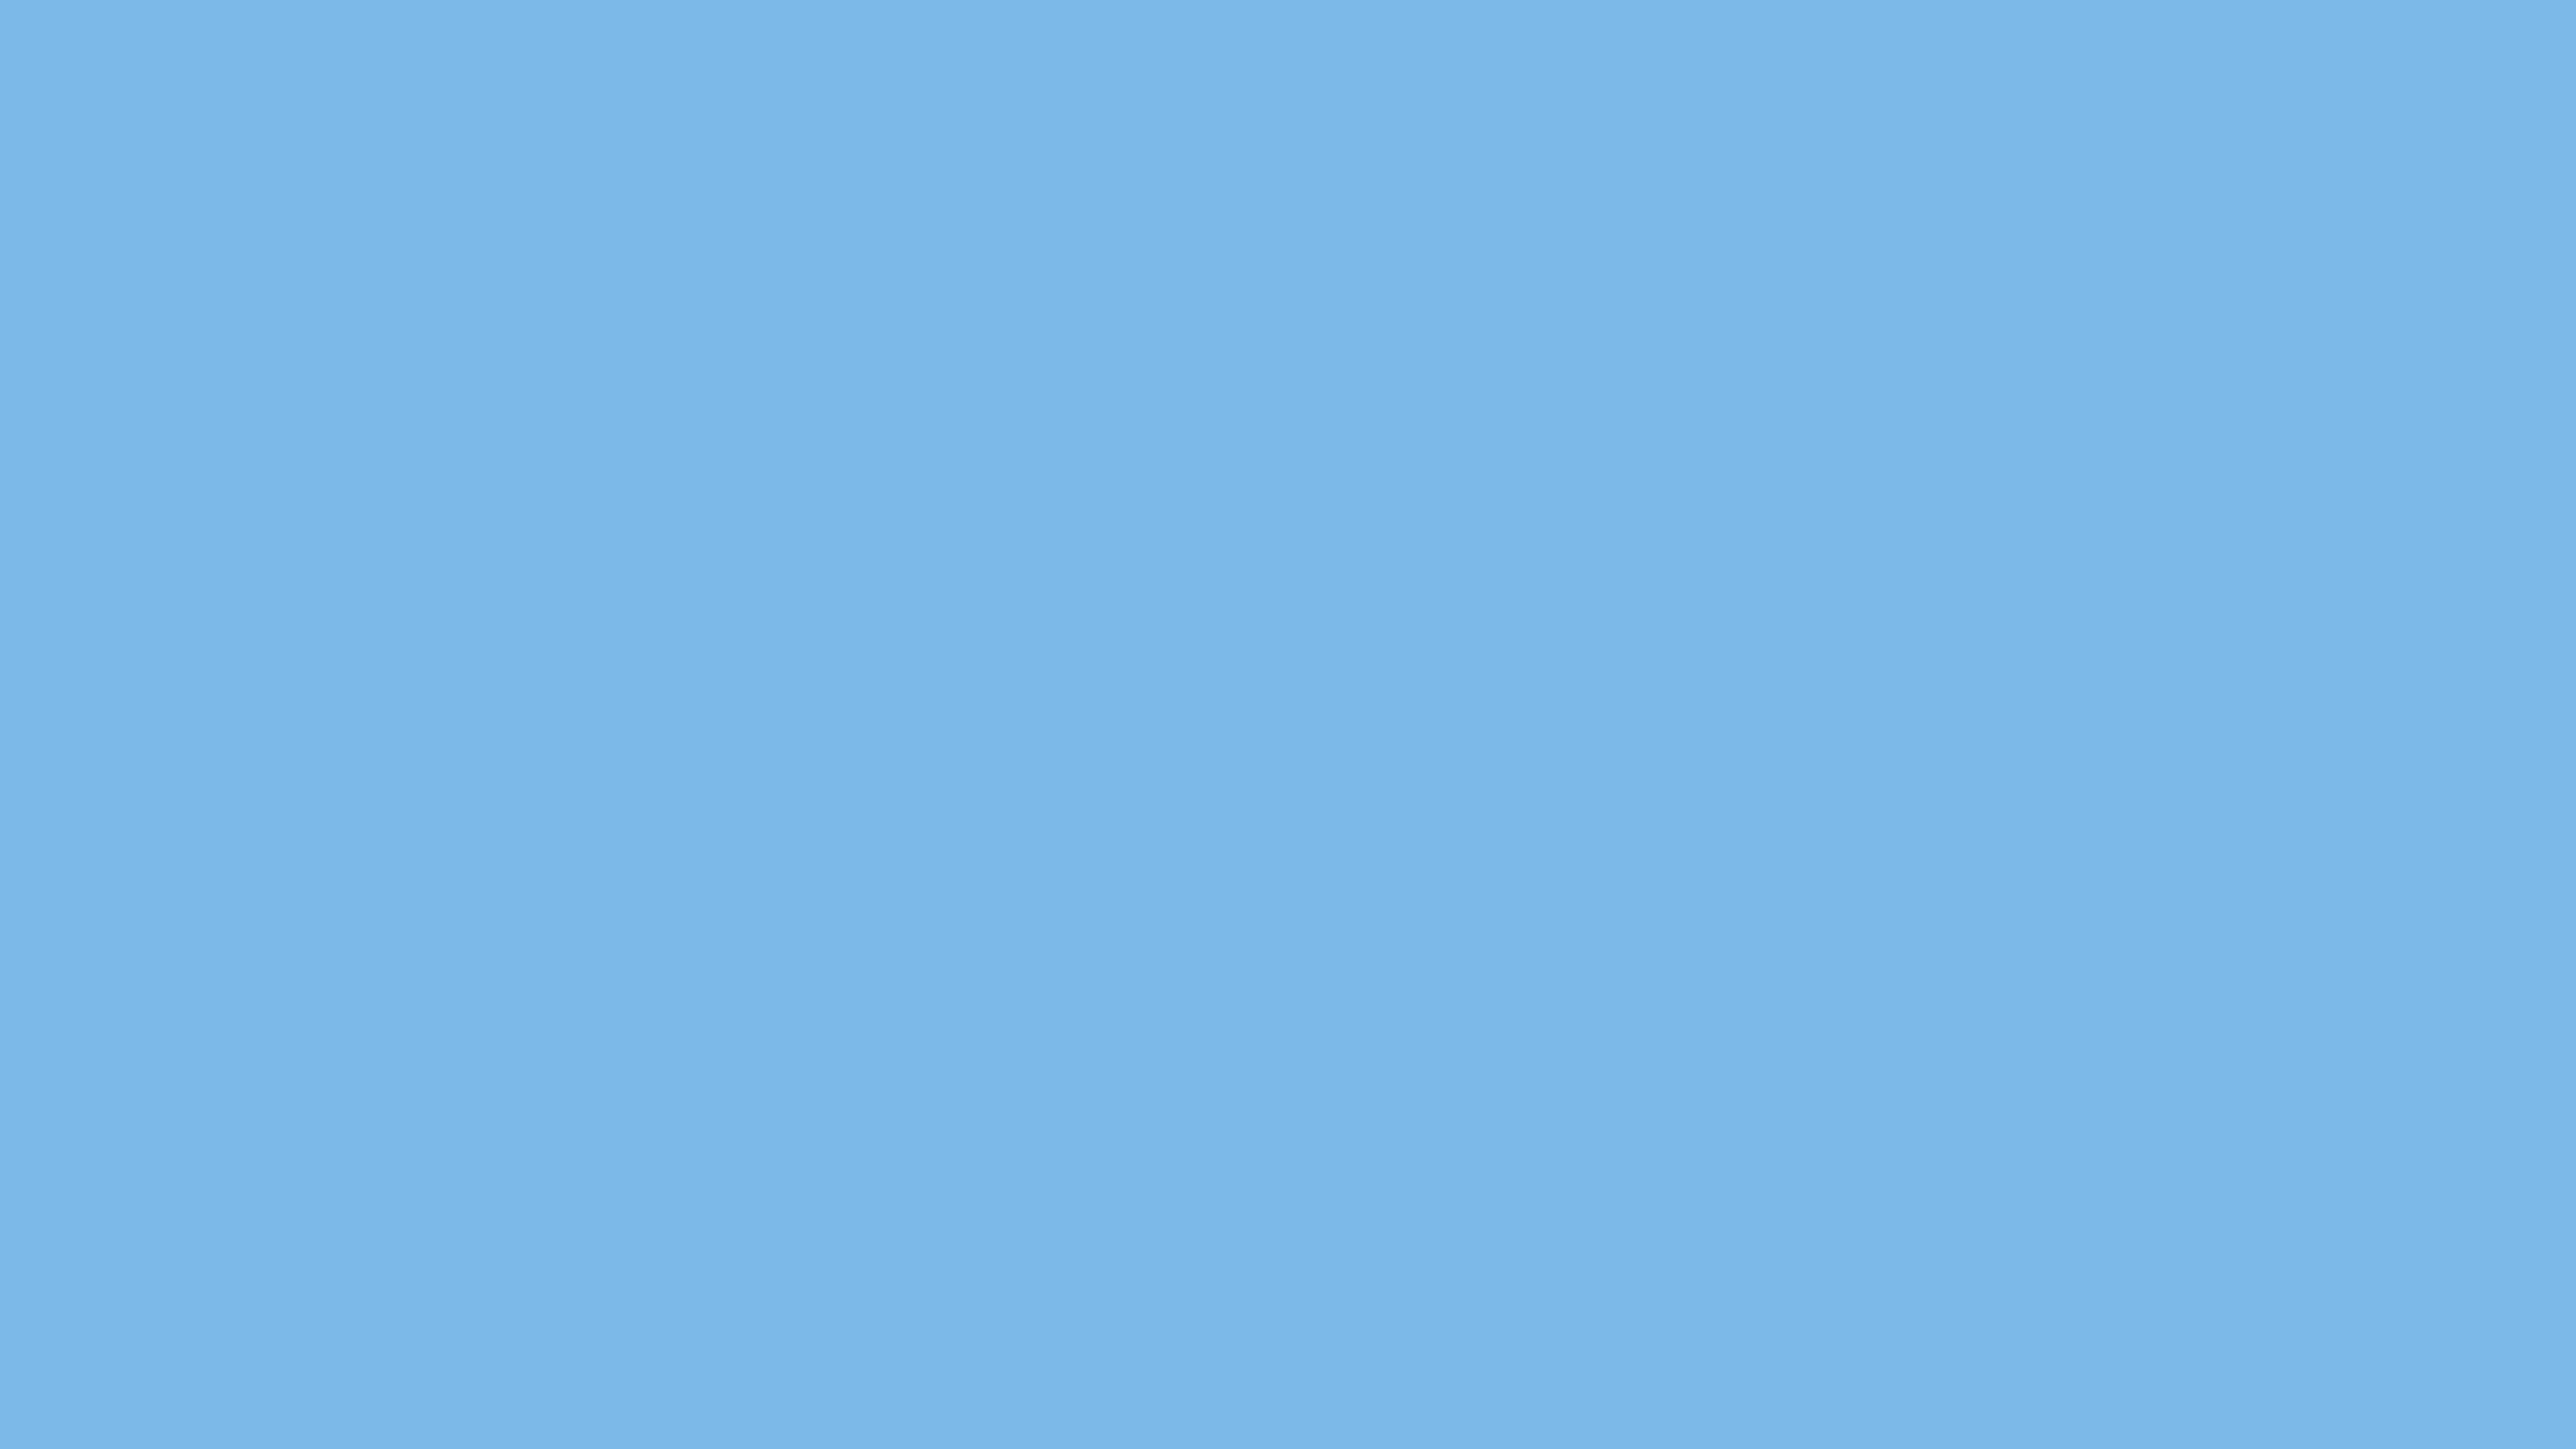 3840x2160 Aero Solid Color Background